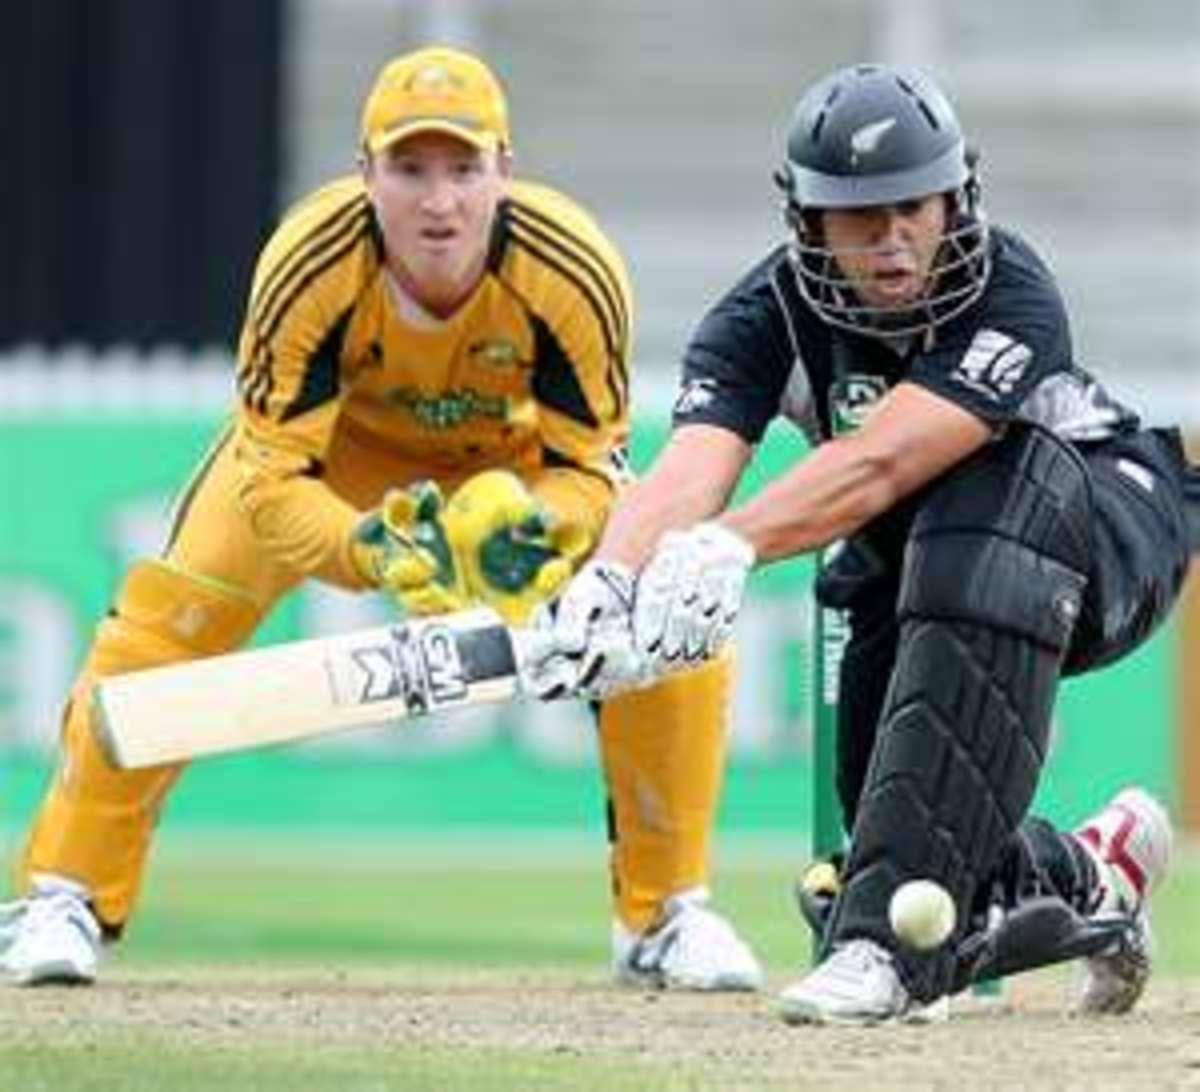 An ODI between Australia and New Zealand